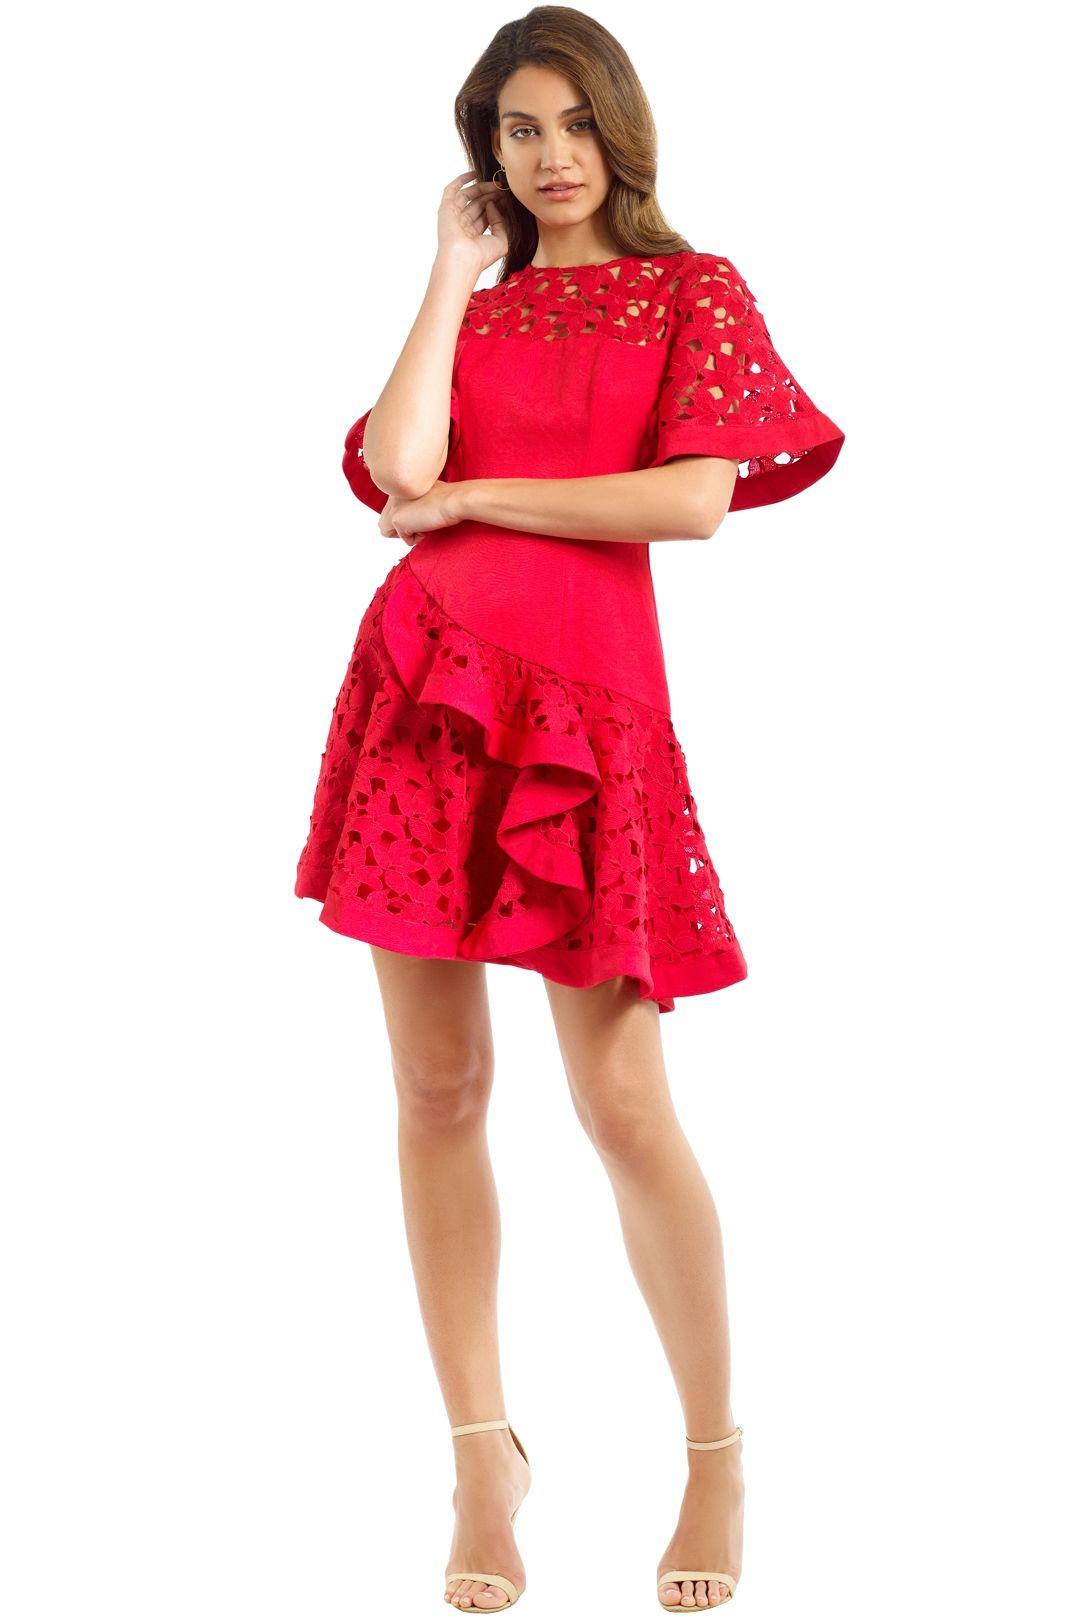 Keepsake - Headlines Mini Dress - Red - Front